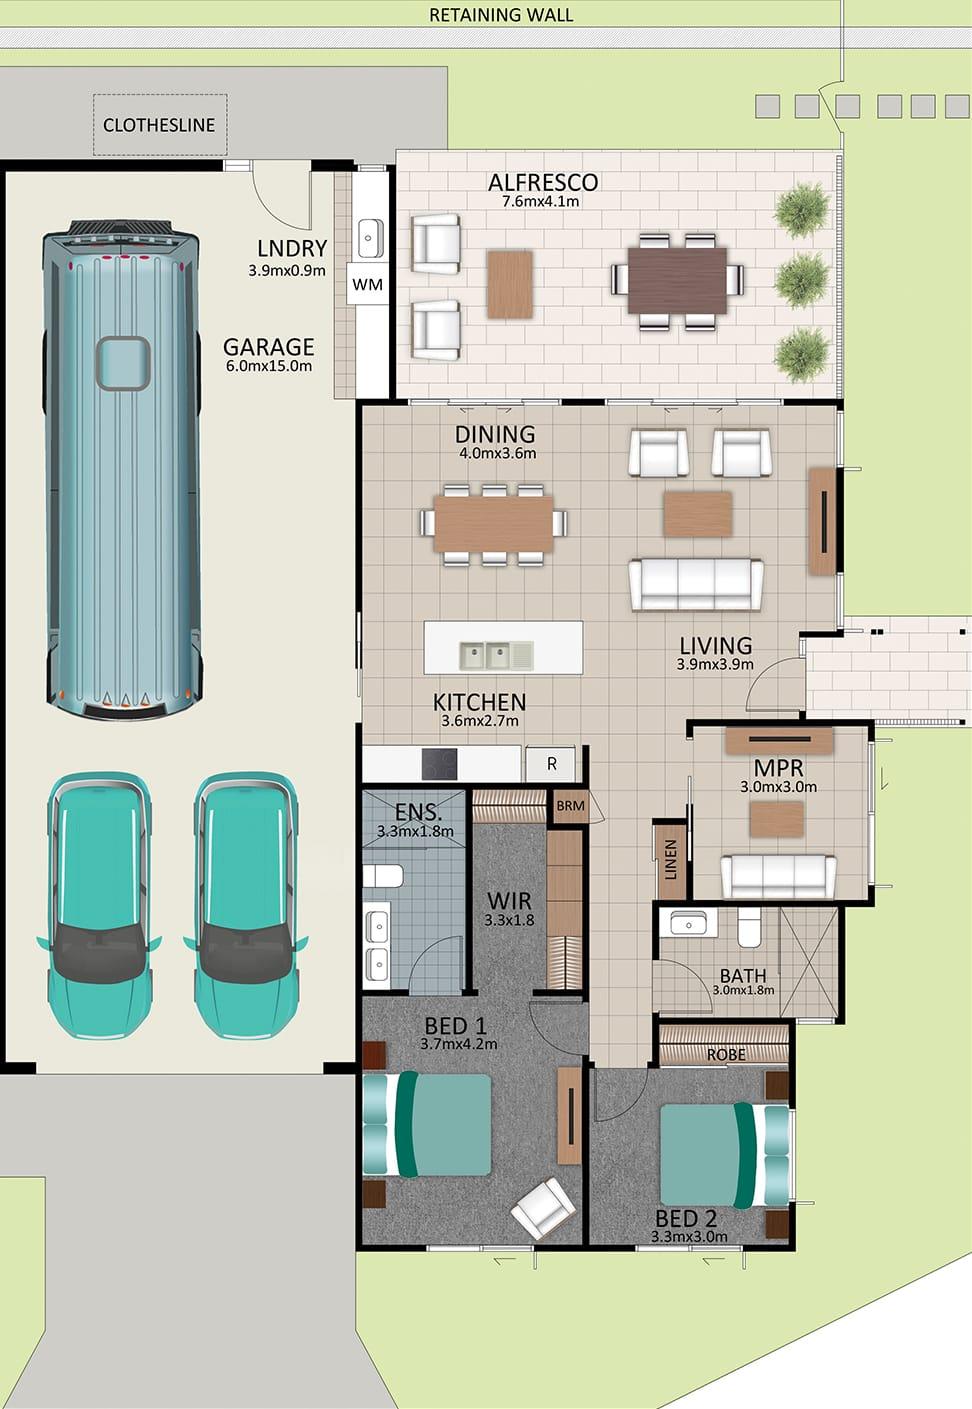 LAT25 Floorplan GAL OCT20 LOT 206 - Lot 206